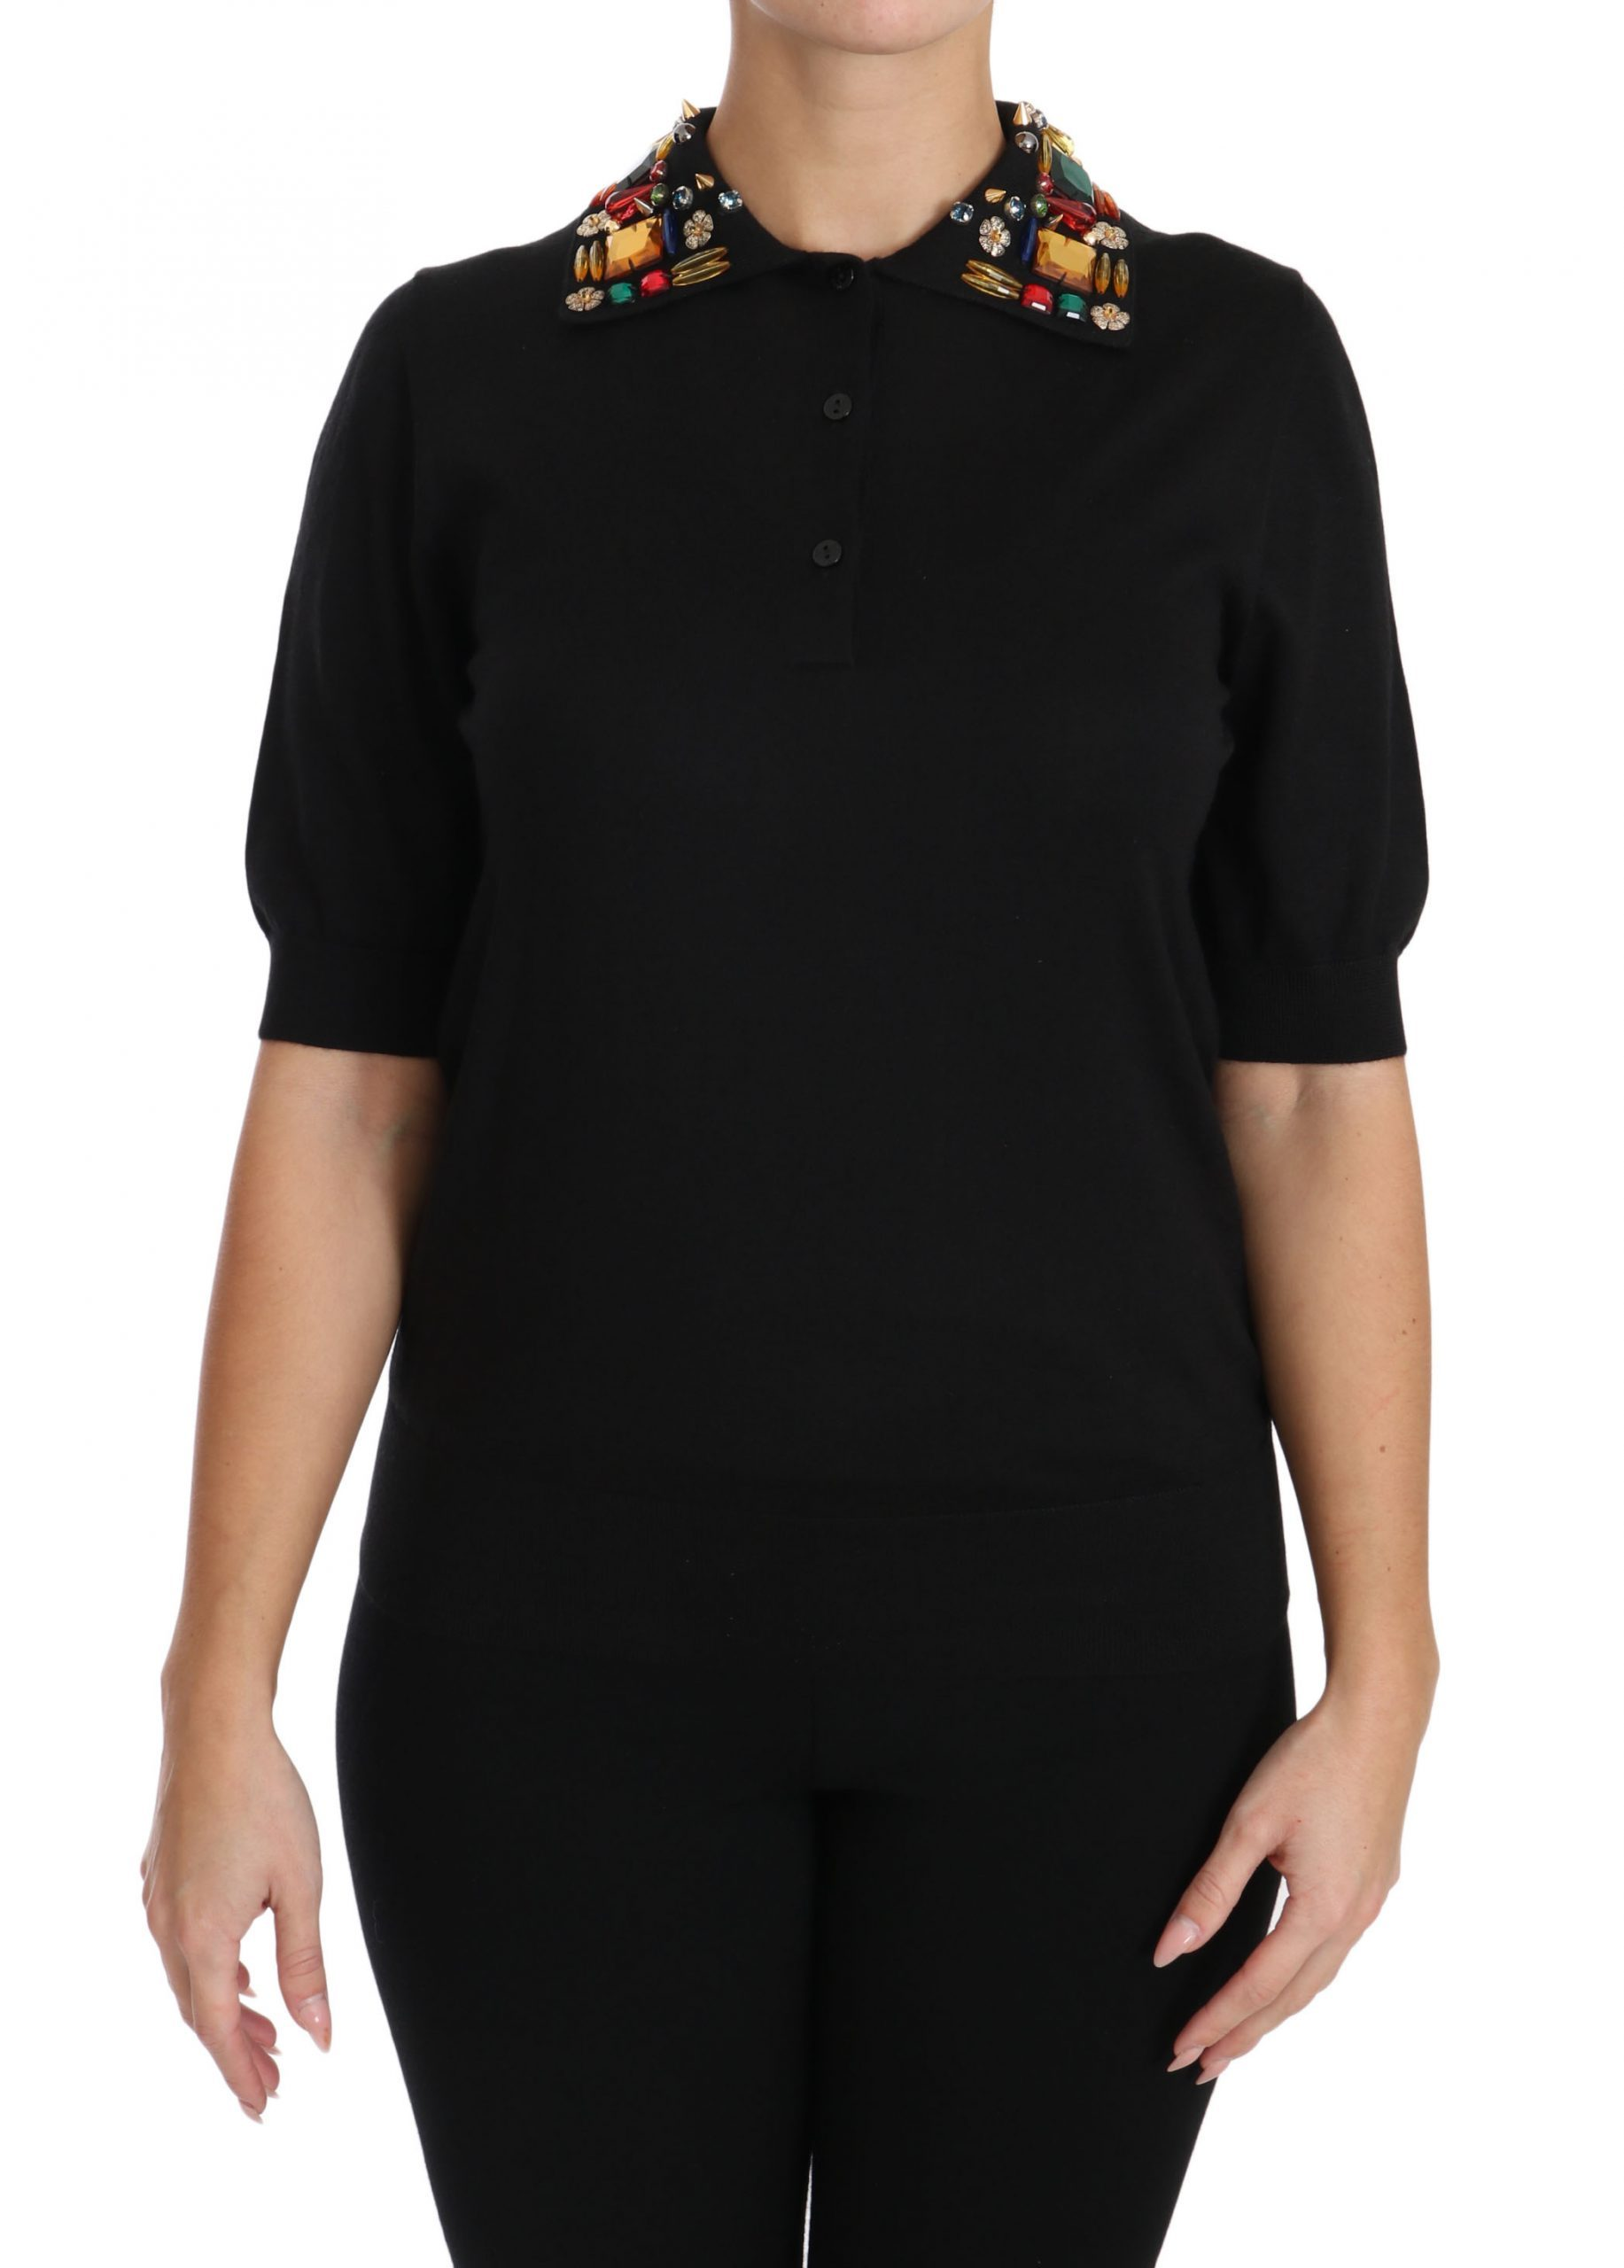 Dolce & Gabbana Women's Cashmere Crystal Top Black TSH3019-38 - IT38 XS